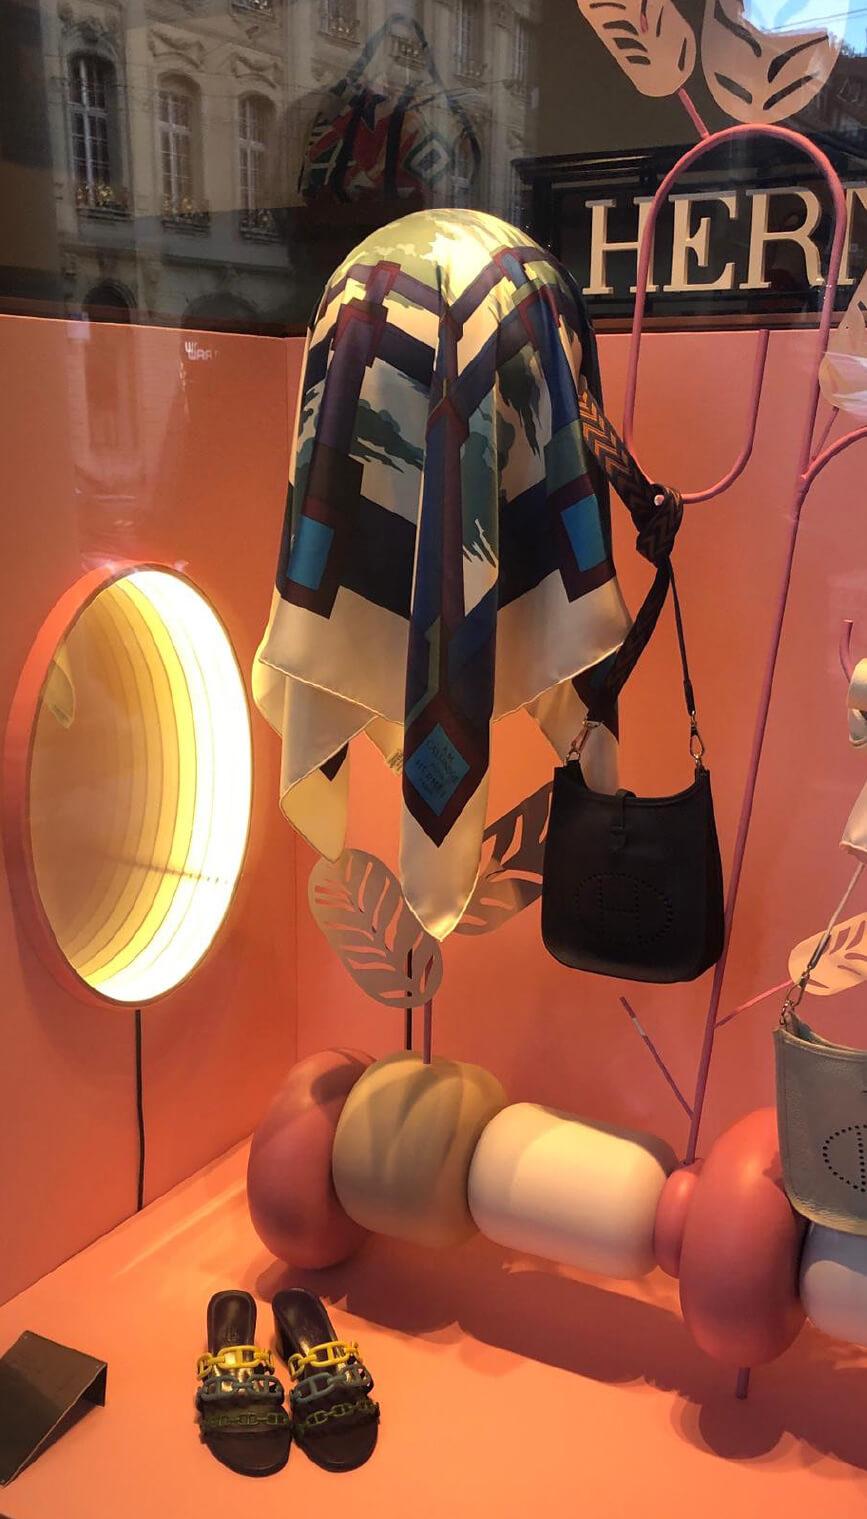 hermes-suisse-window-vitrine-mersh-scenographie-decor-display-retail-luxe-OKTO-_03